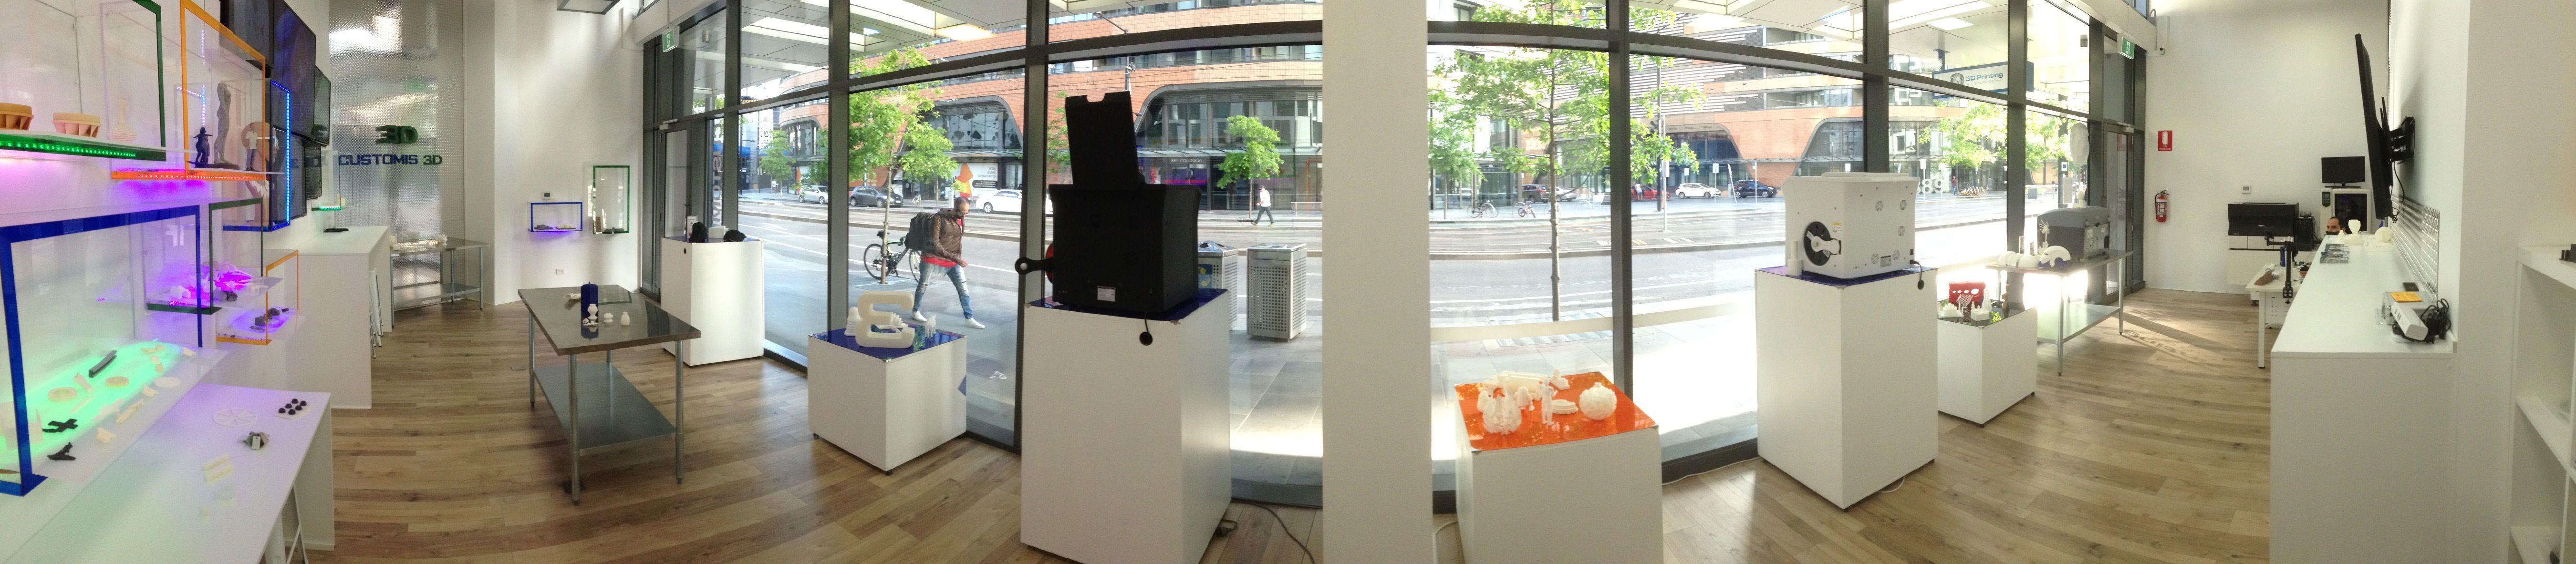 3D Printing Meetup - Melbourne